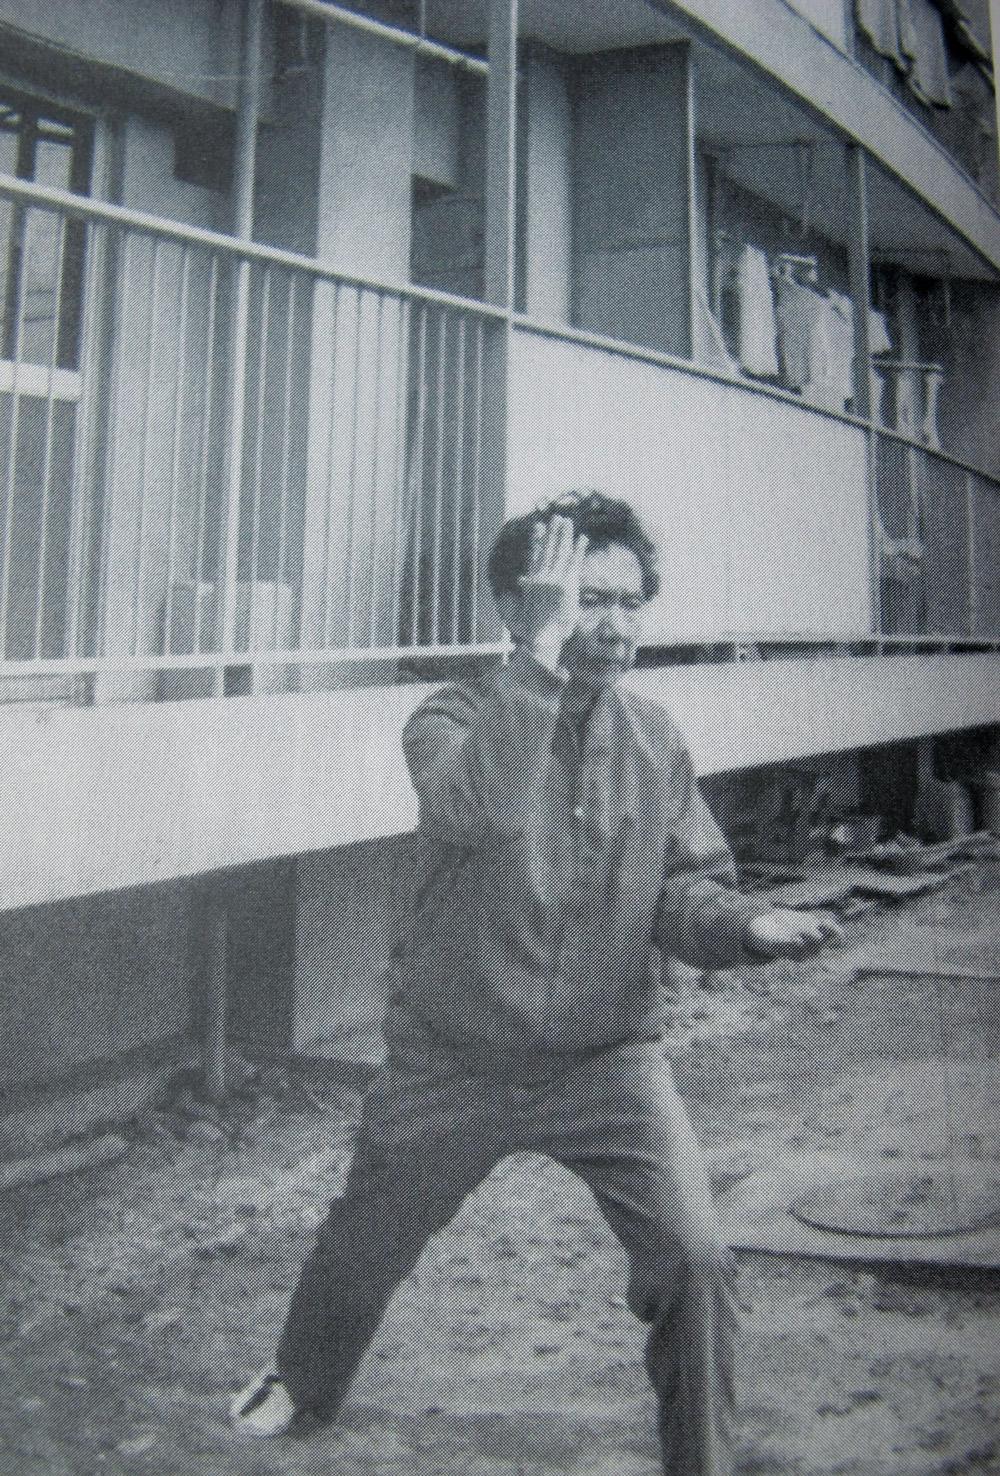 Master Suzuki demonstrates a move during Boehm's training.